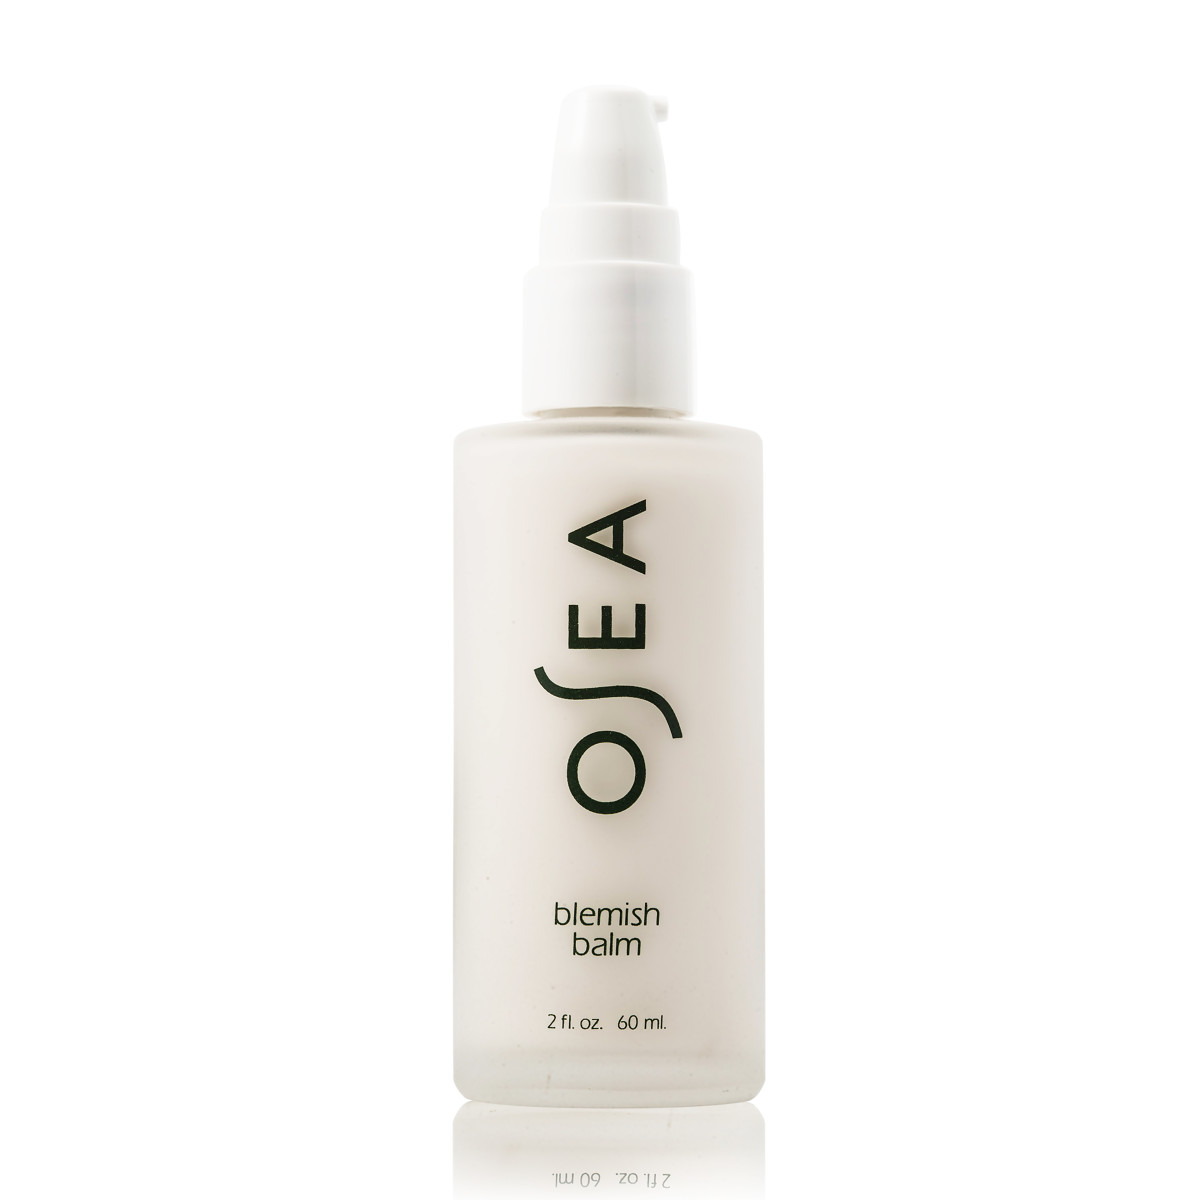 OSEA Malibu Skincare Solved 3 of My Biggest Beauty Woes